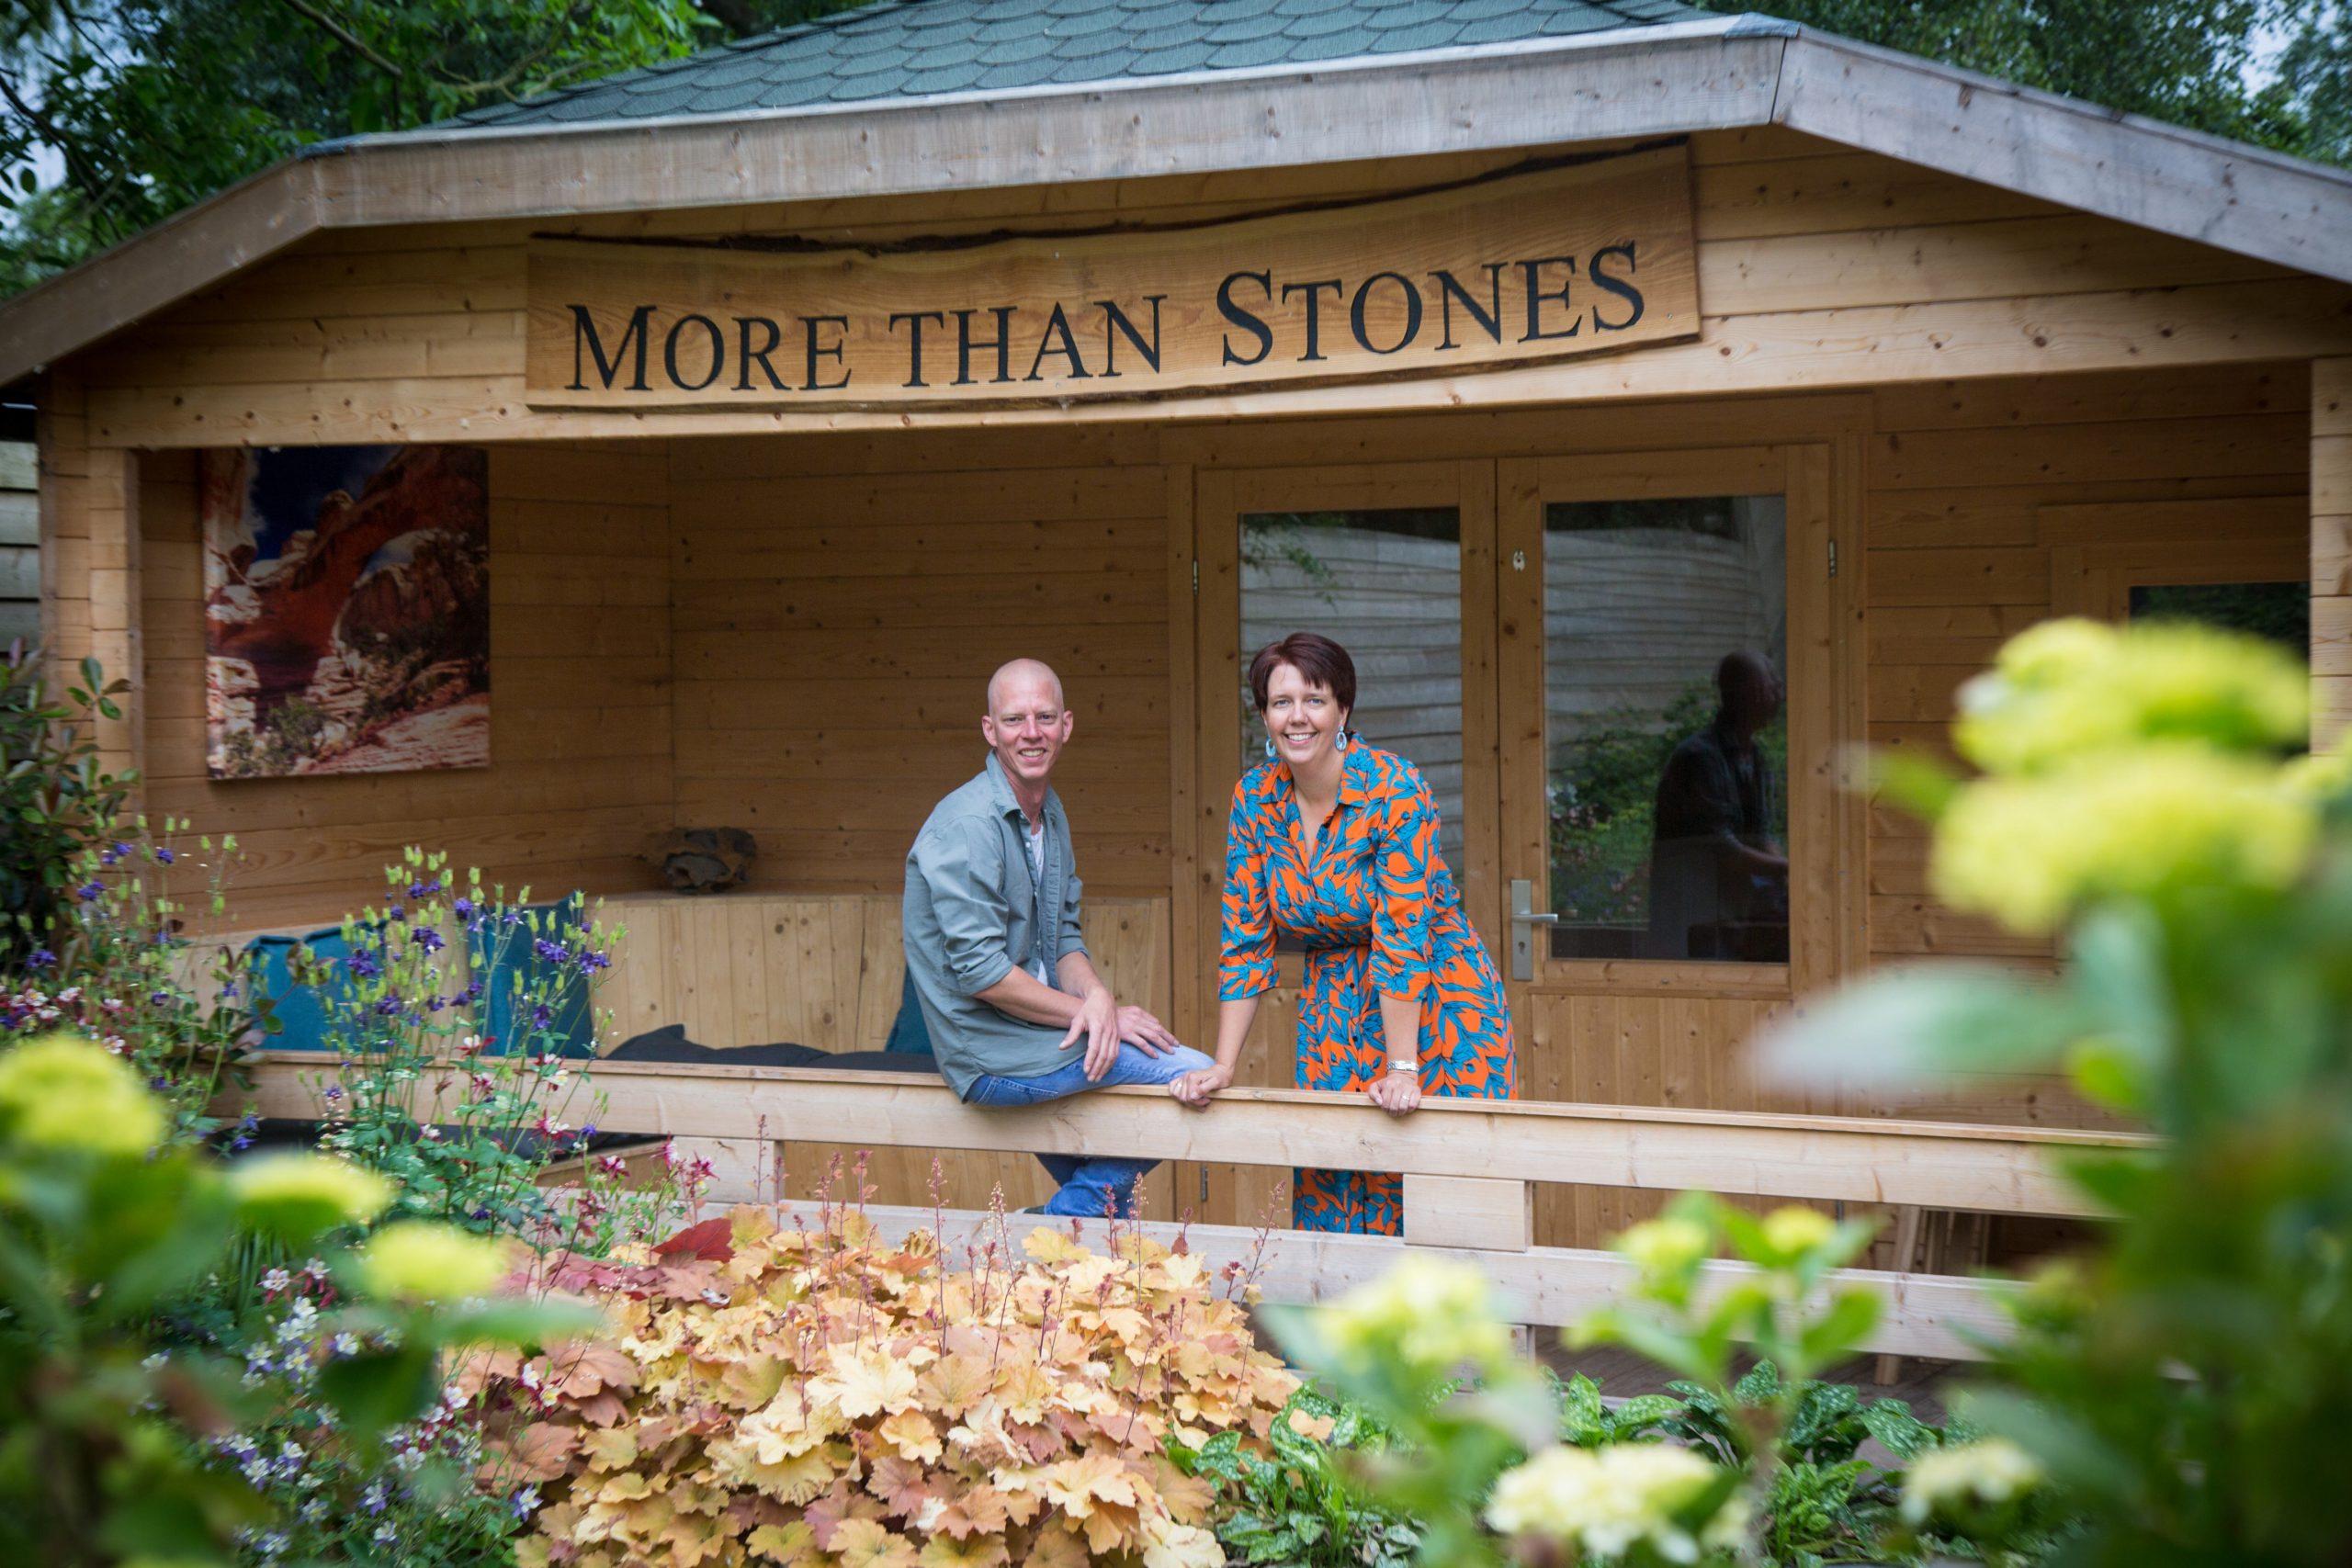 winkel More than Stones in Rotterdam-Nesselande